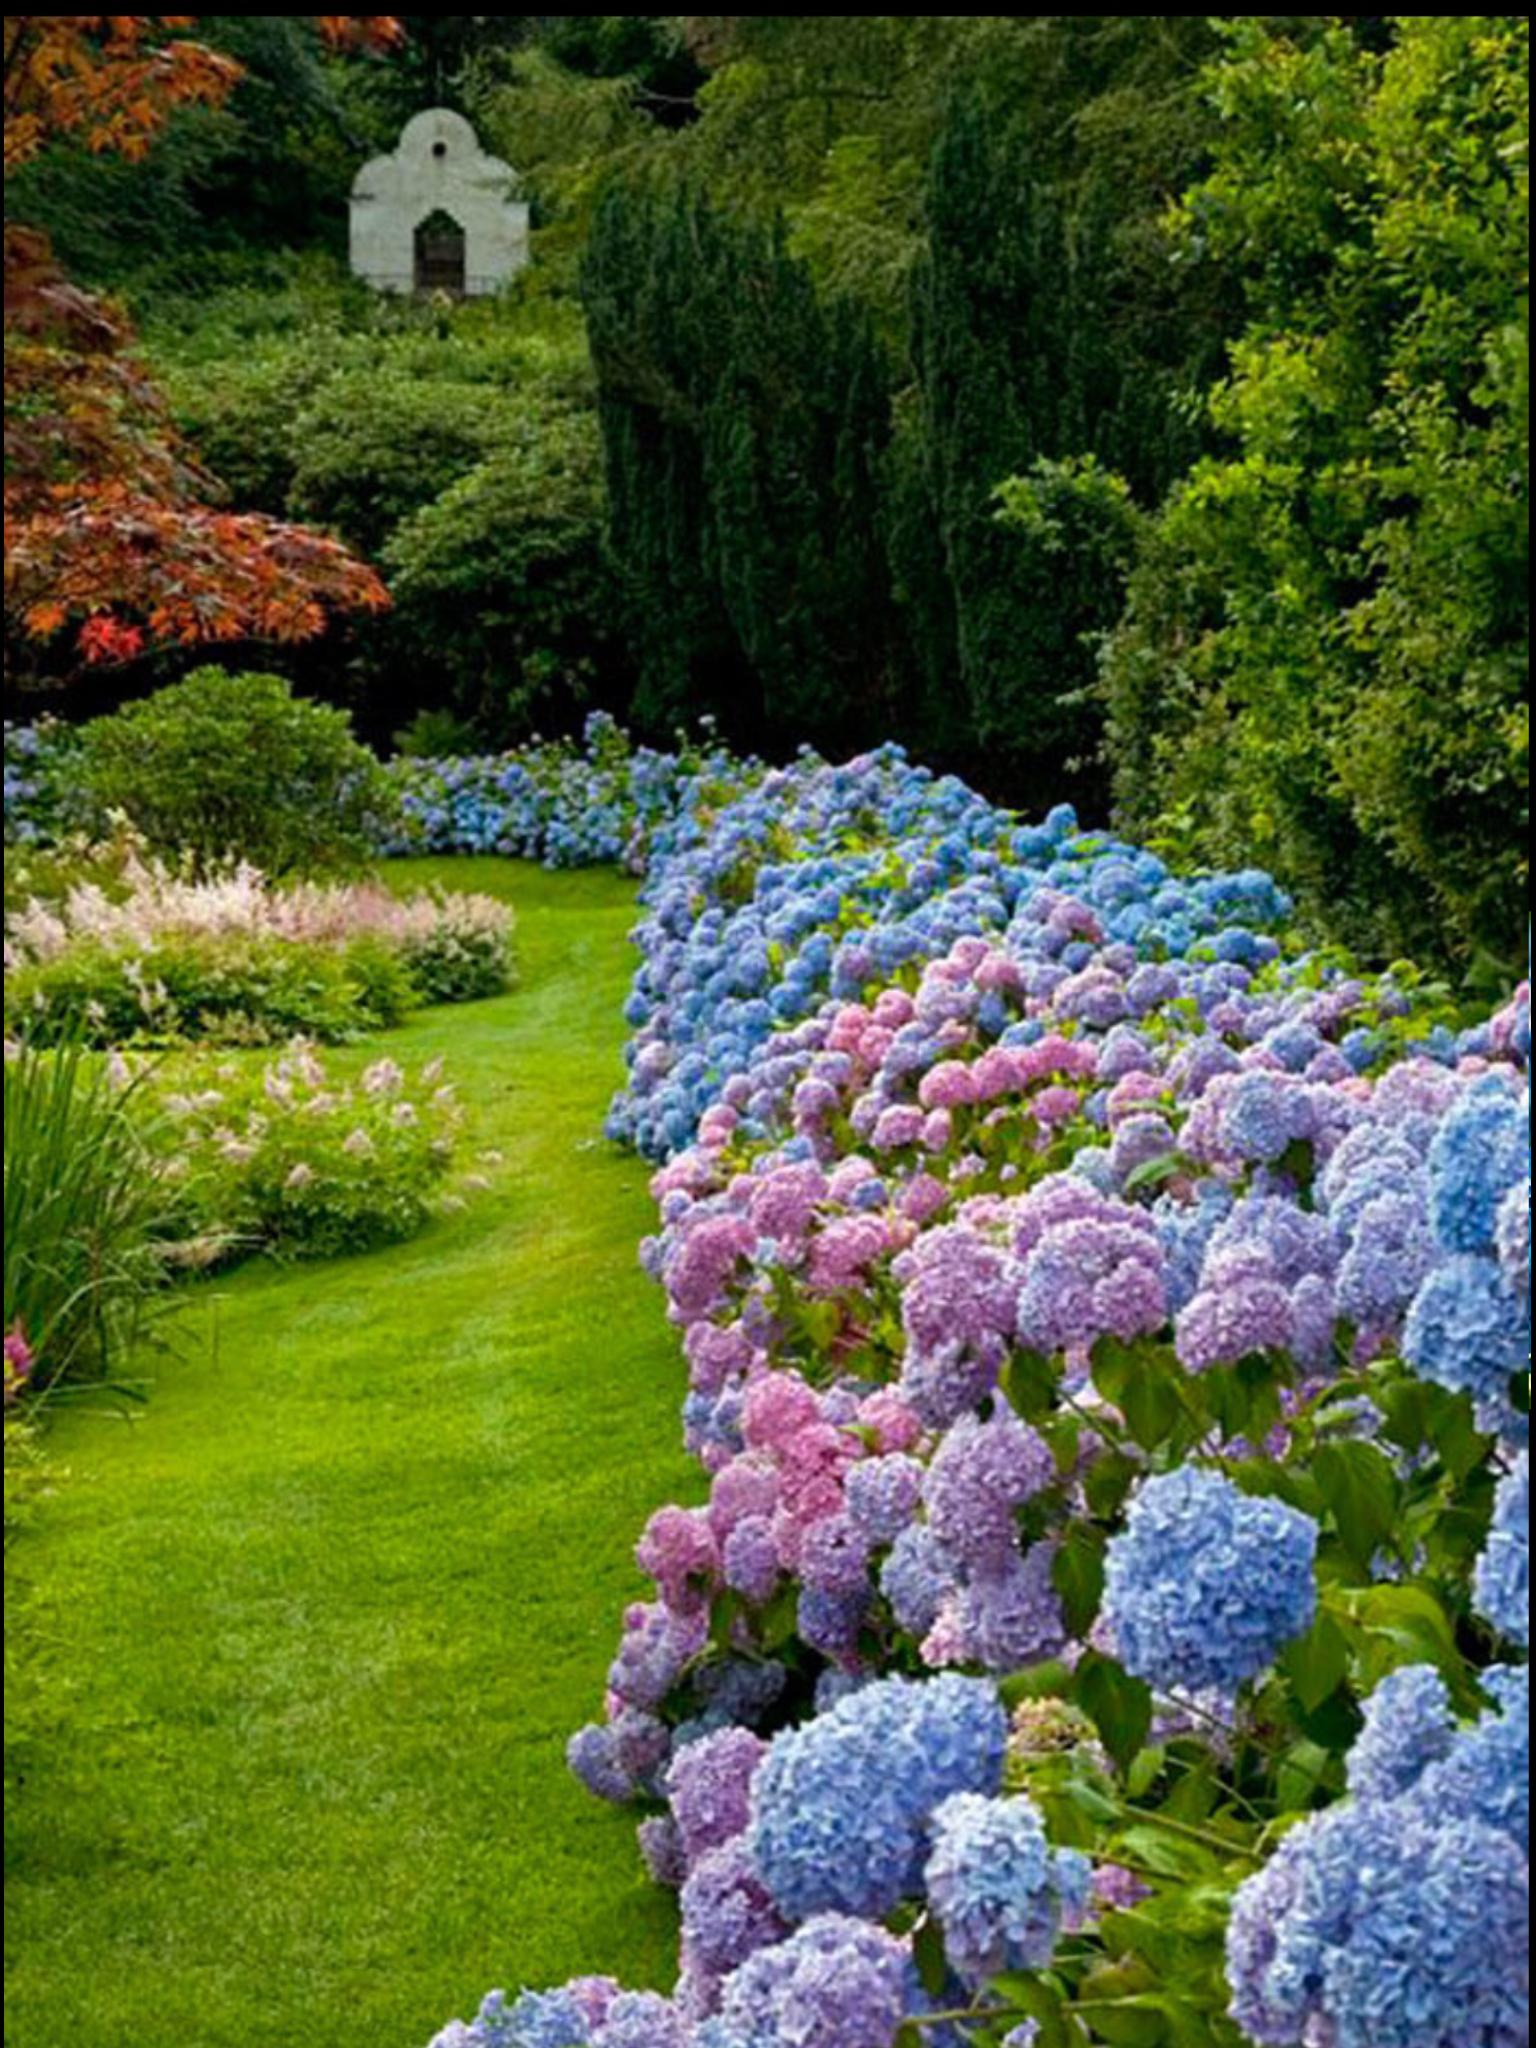 Pin By Paul Creasy On Nature Hydrangea Garden Hydrangea